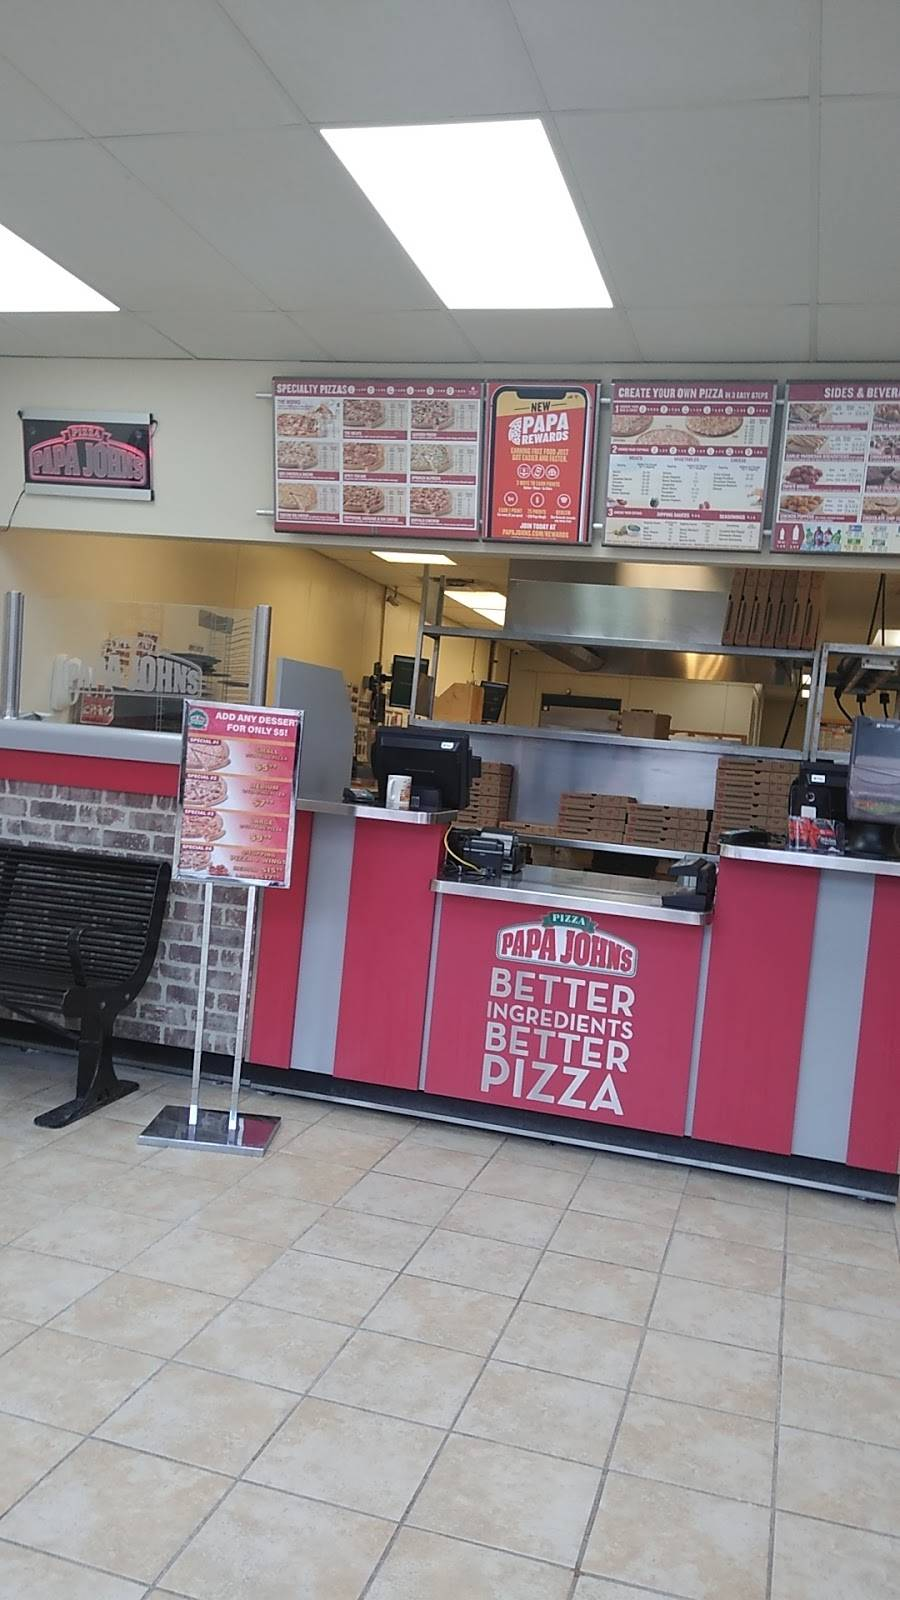 Papa Johns Pizza   restaurant   721 Anderson Ave, Cliffside Park, NJ 07010, USA   2019437272 OR +1 201-943-7272